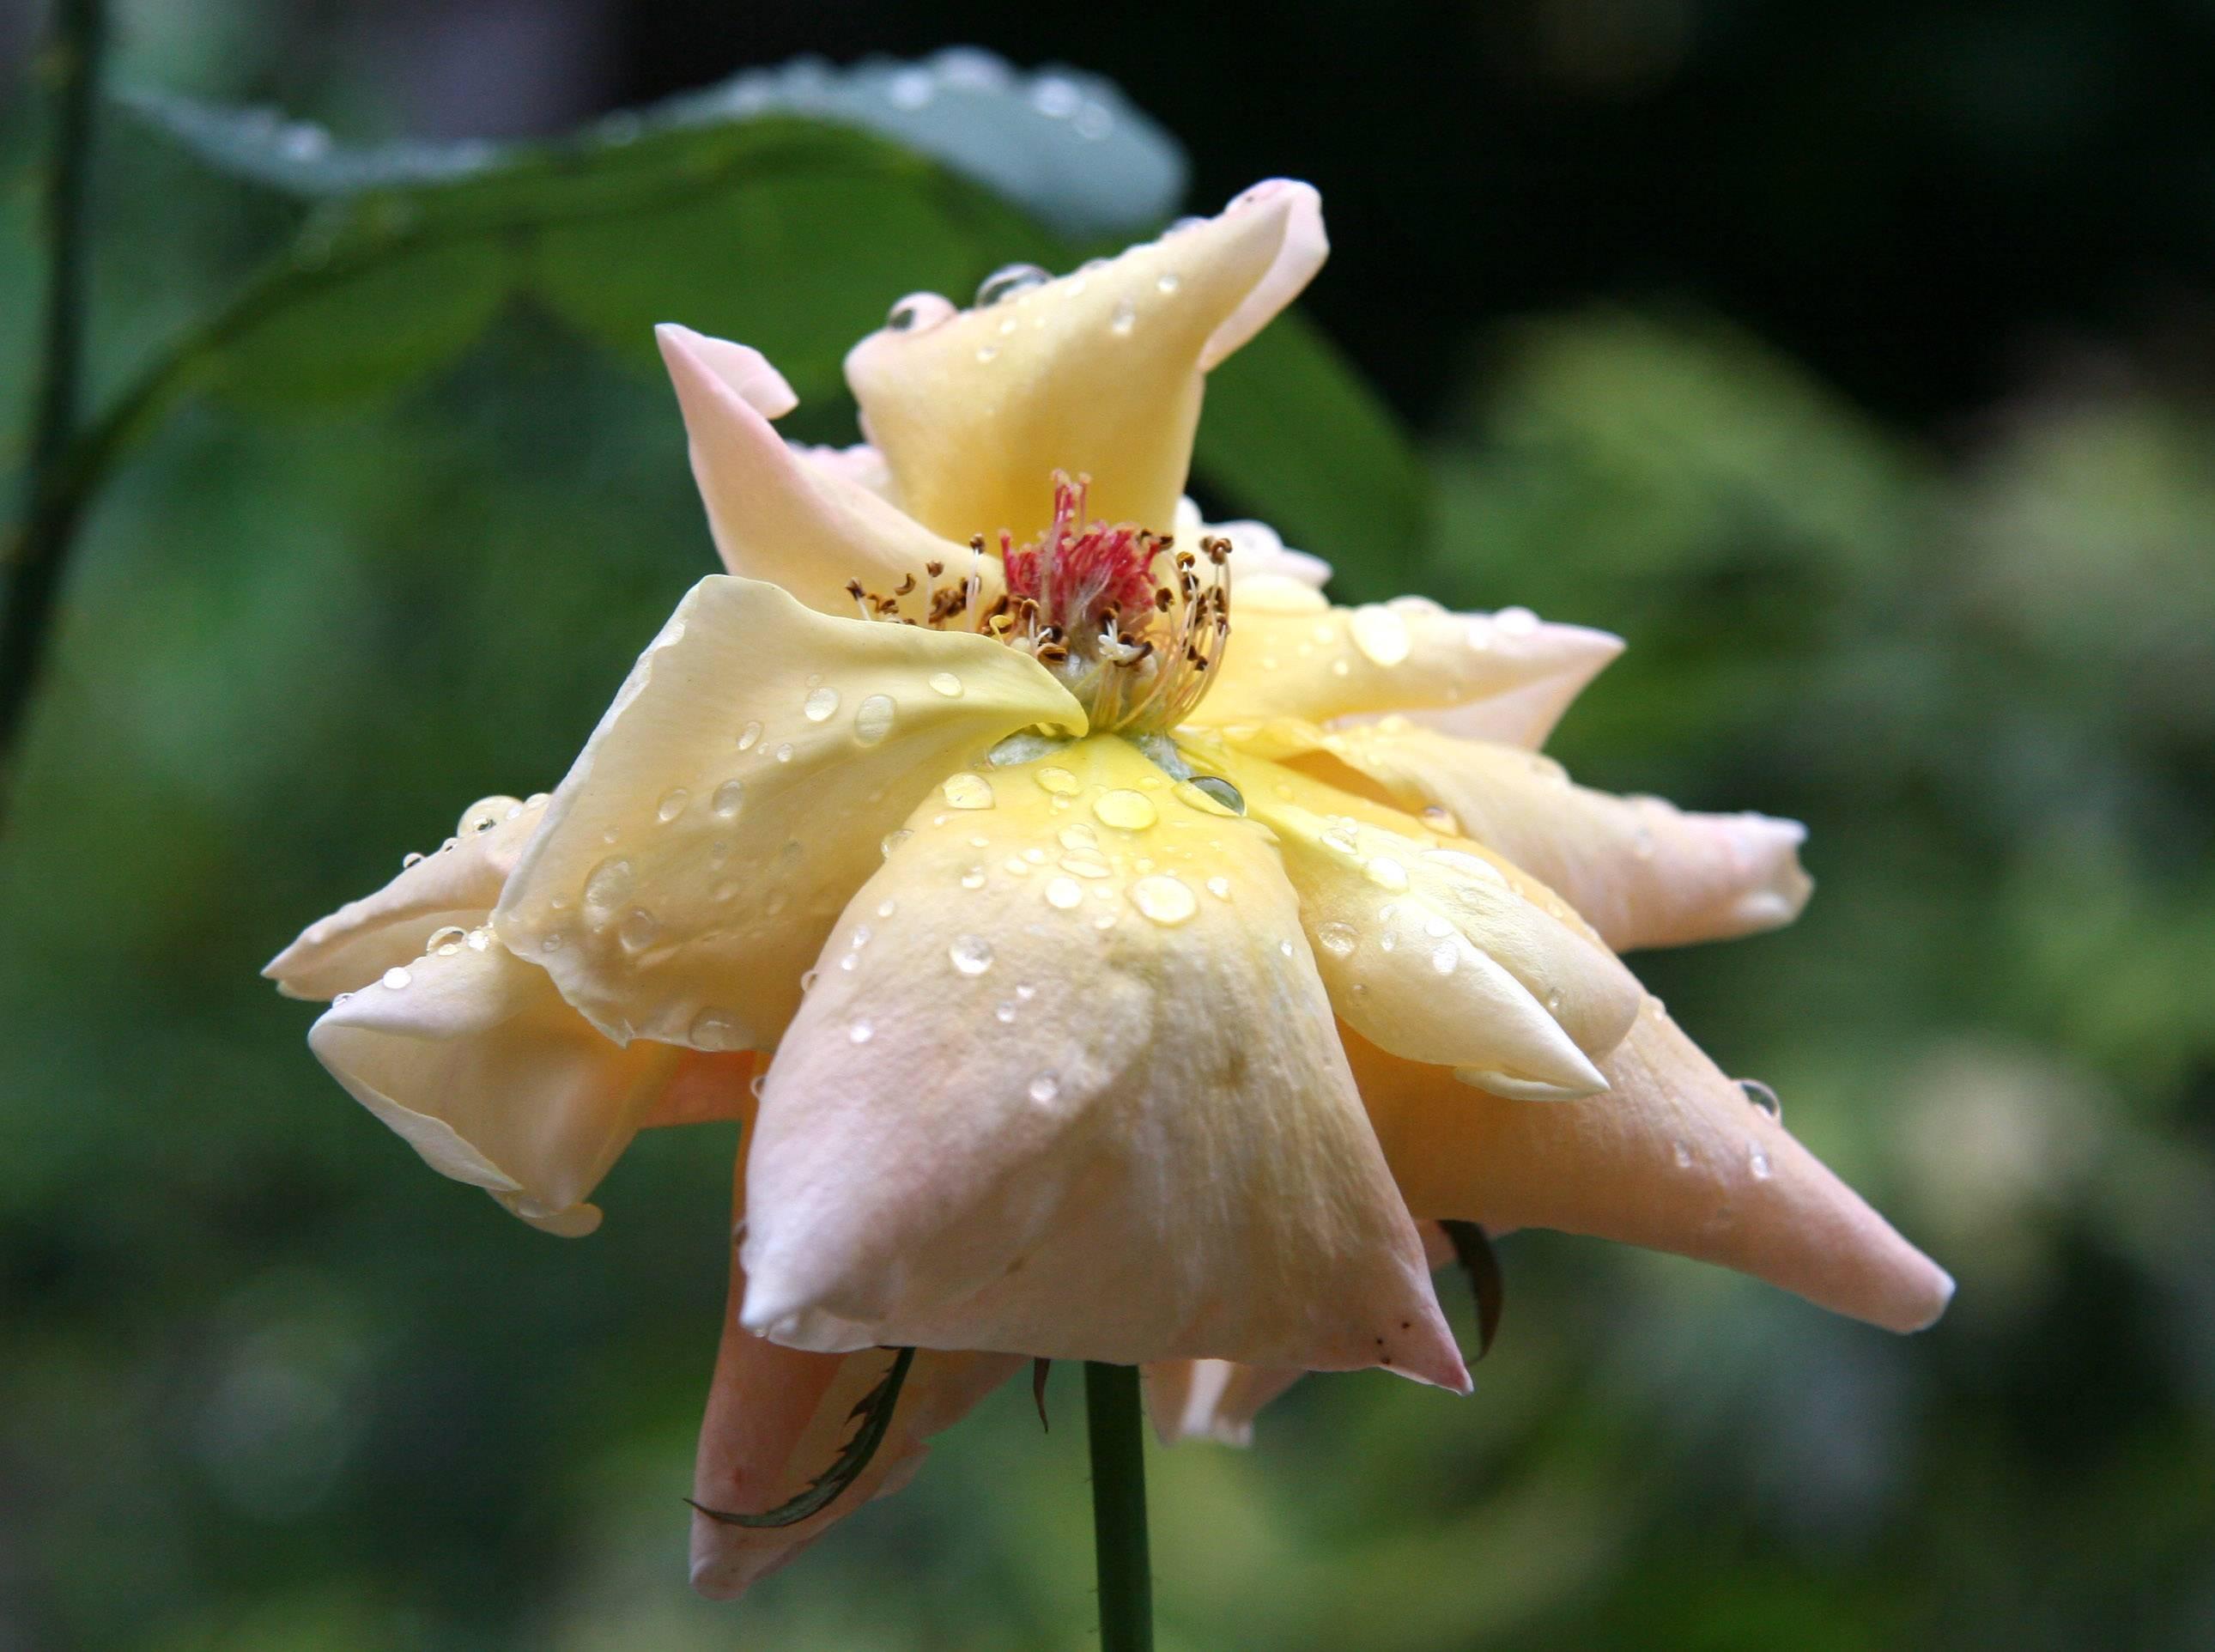 Rain on Rose Petals